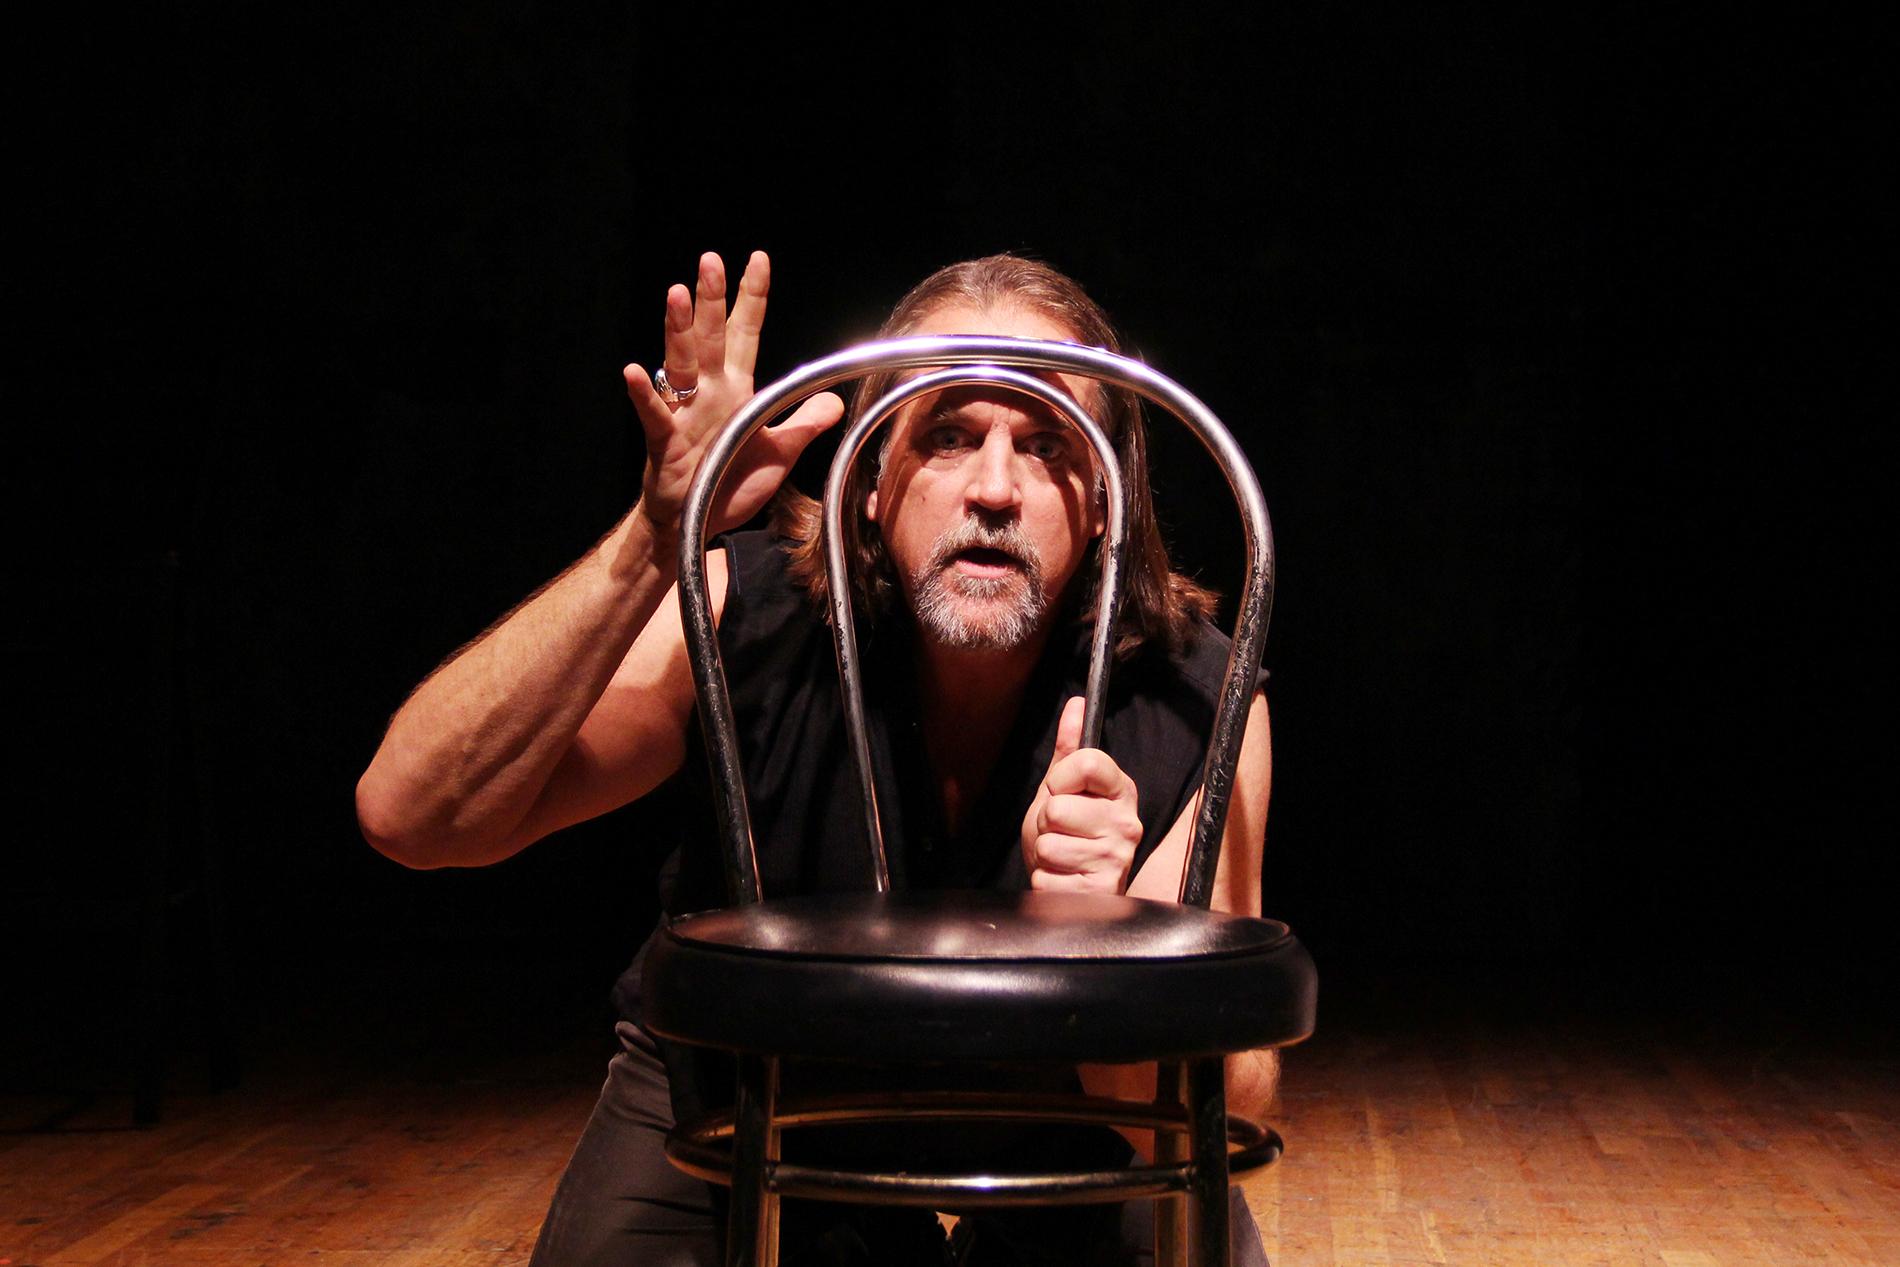 a performer crouching behind a chair